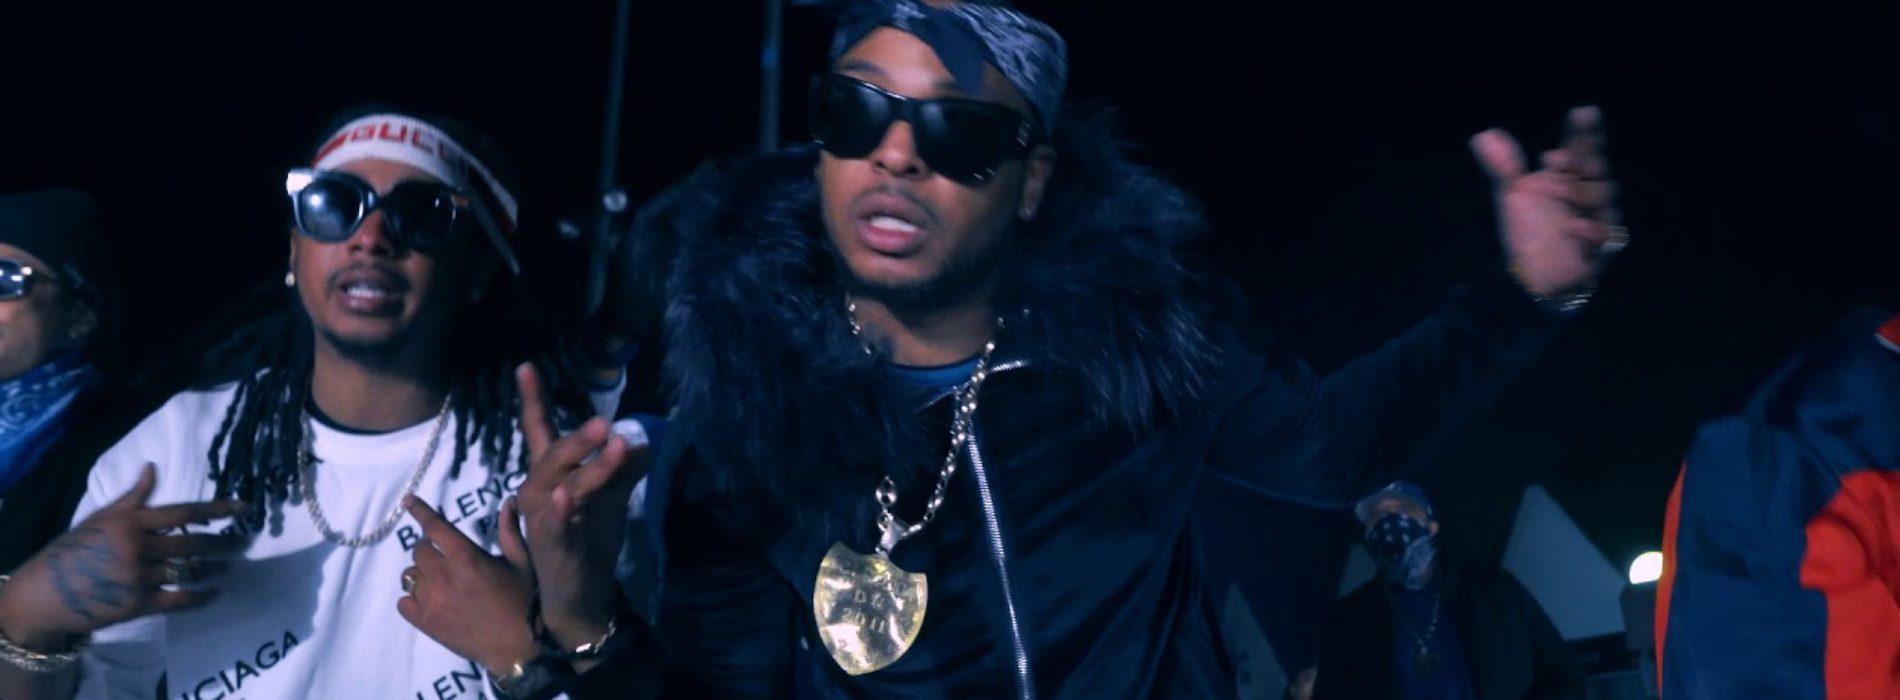 LE KIING, KELLINGSTON ft WALTON, THUG TRISH – ON LARME / Ti Youth Feat JKevlar – Hardcore –  (Clip Officiel) Décembre 2018